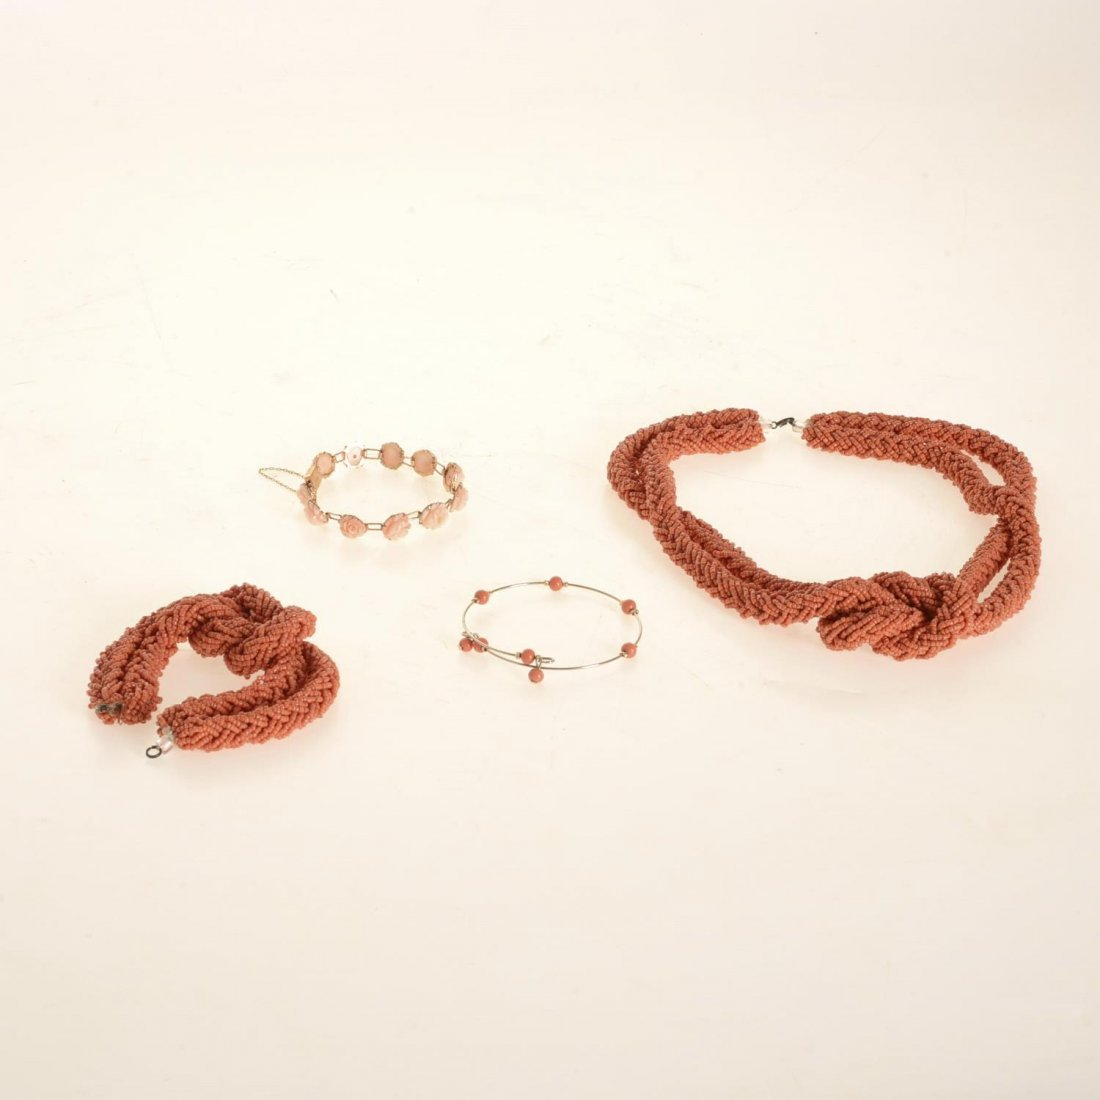 (4) pcs. Antique coral jewelry